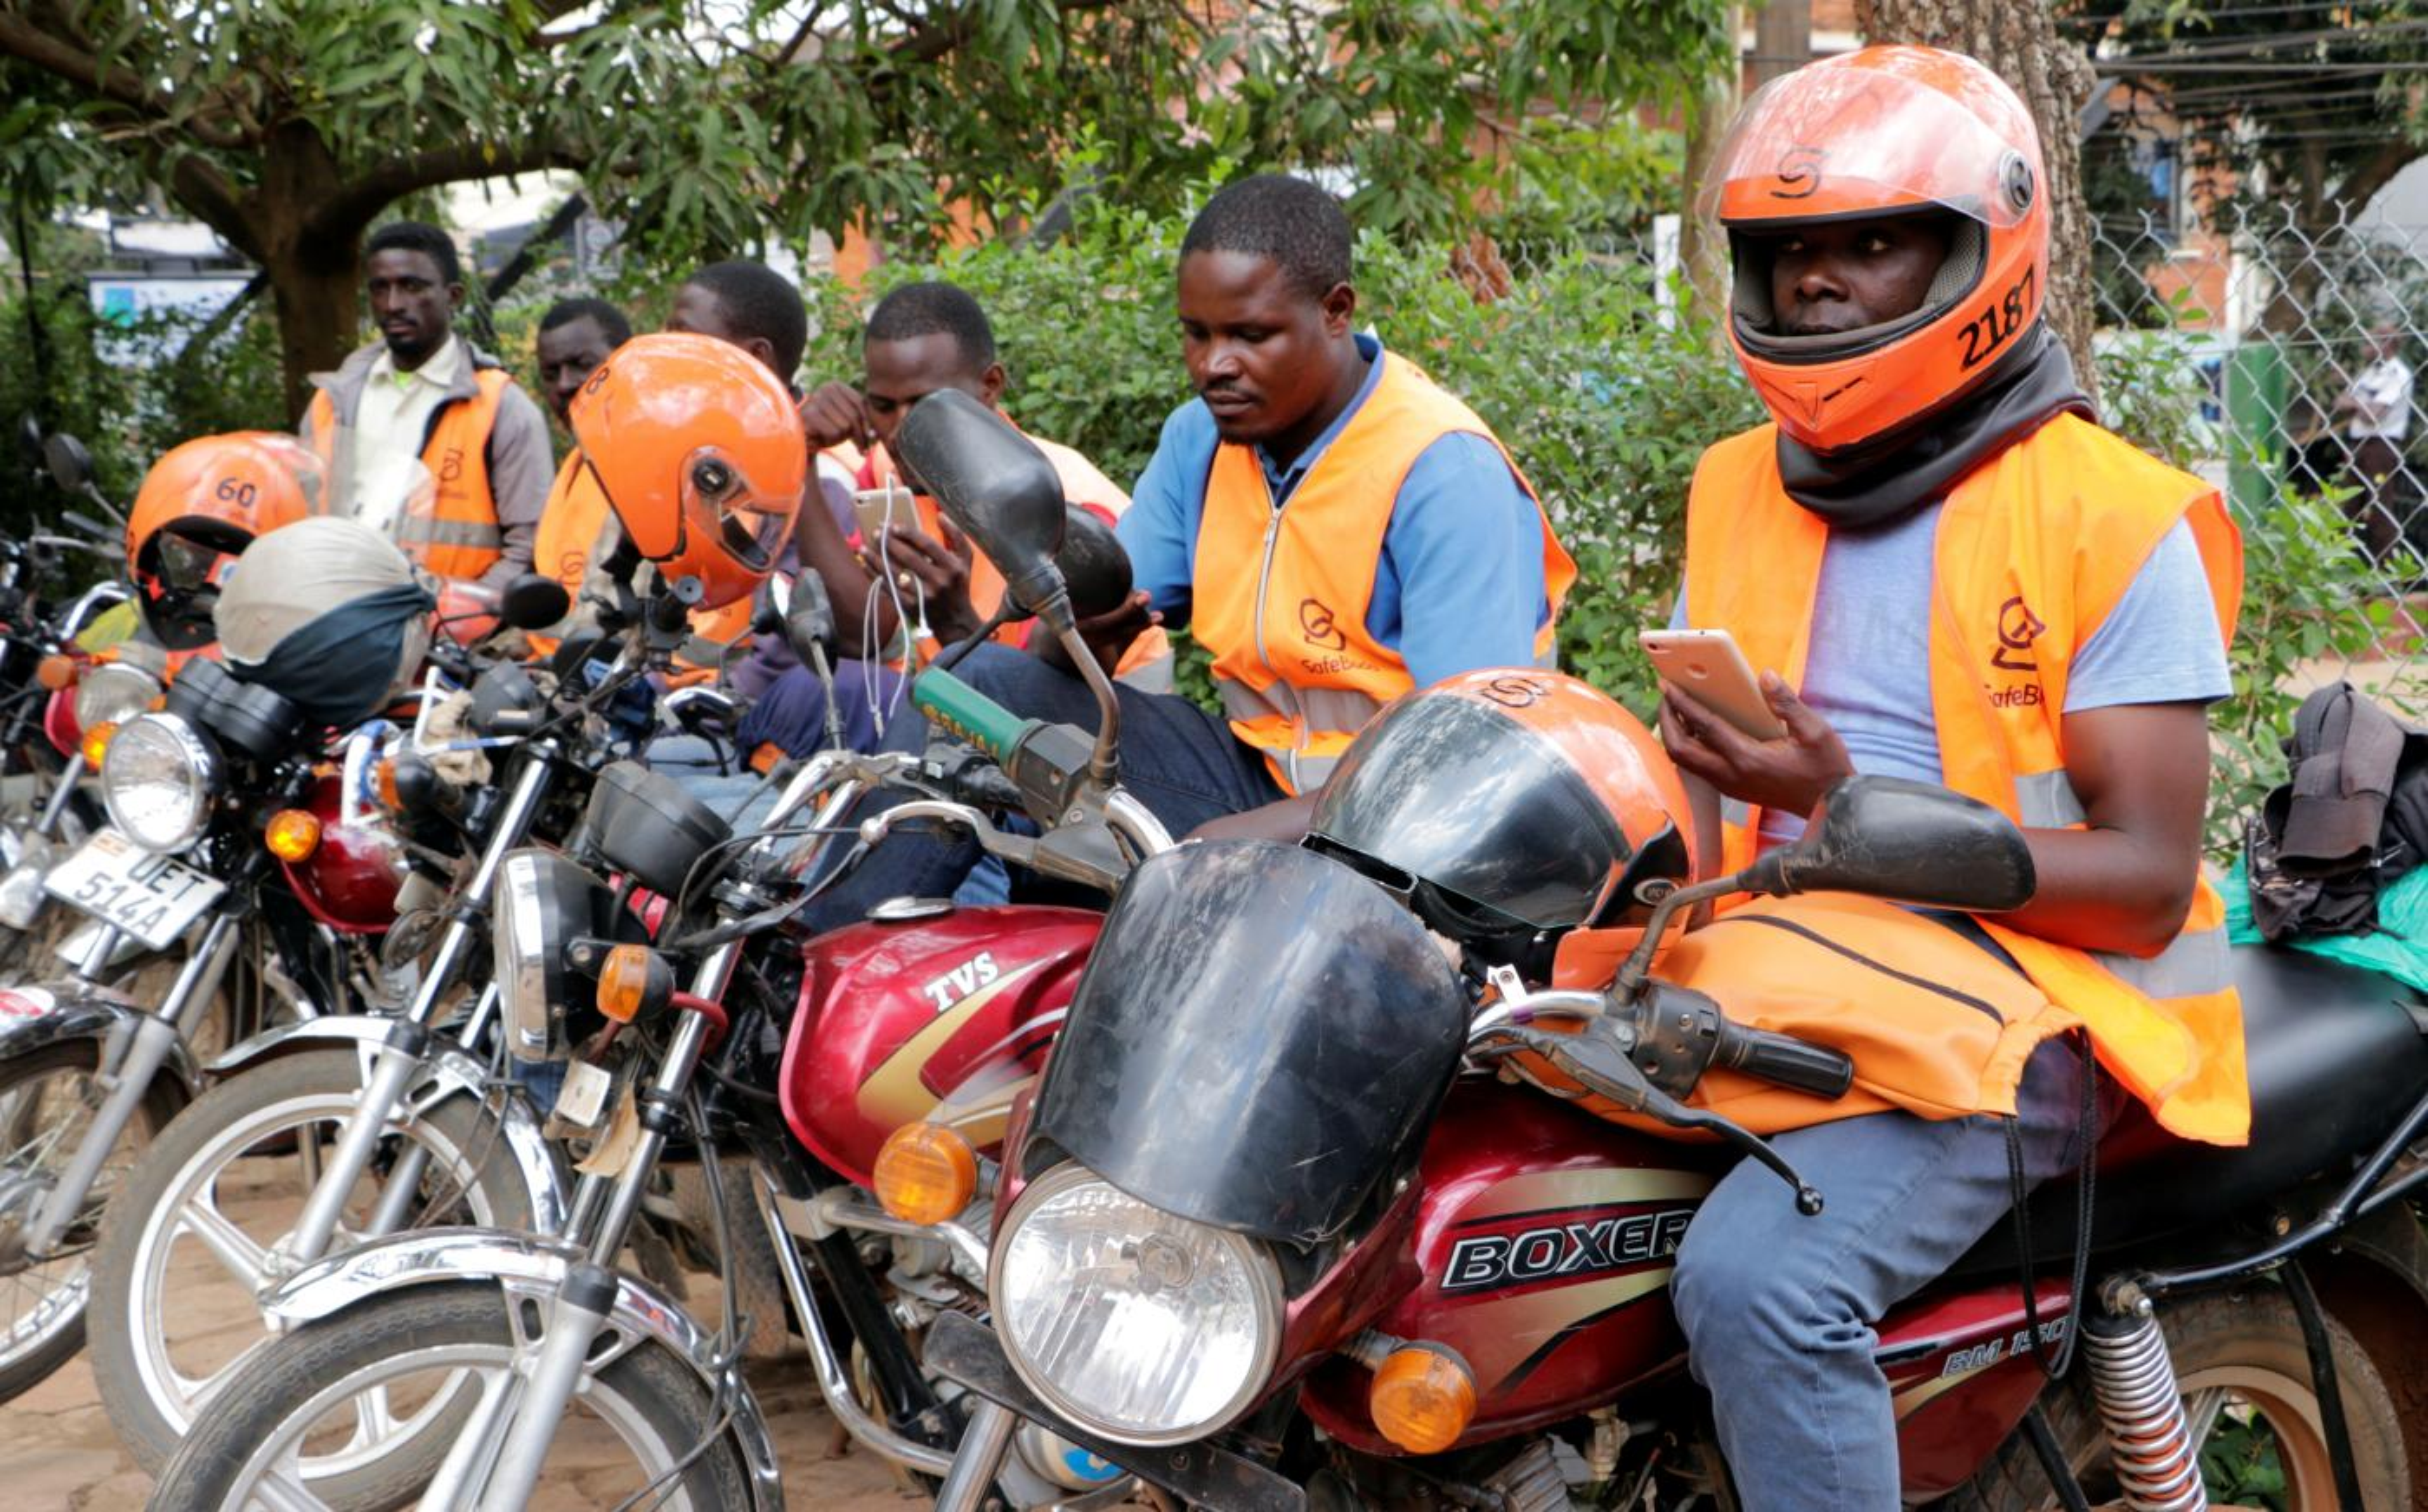 Lagos motorcycle startups Gokada, Max, SafeBoda fight for market - Quartz